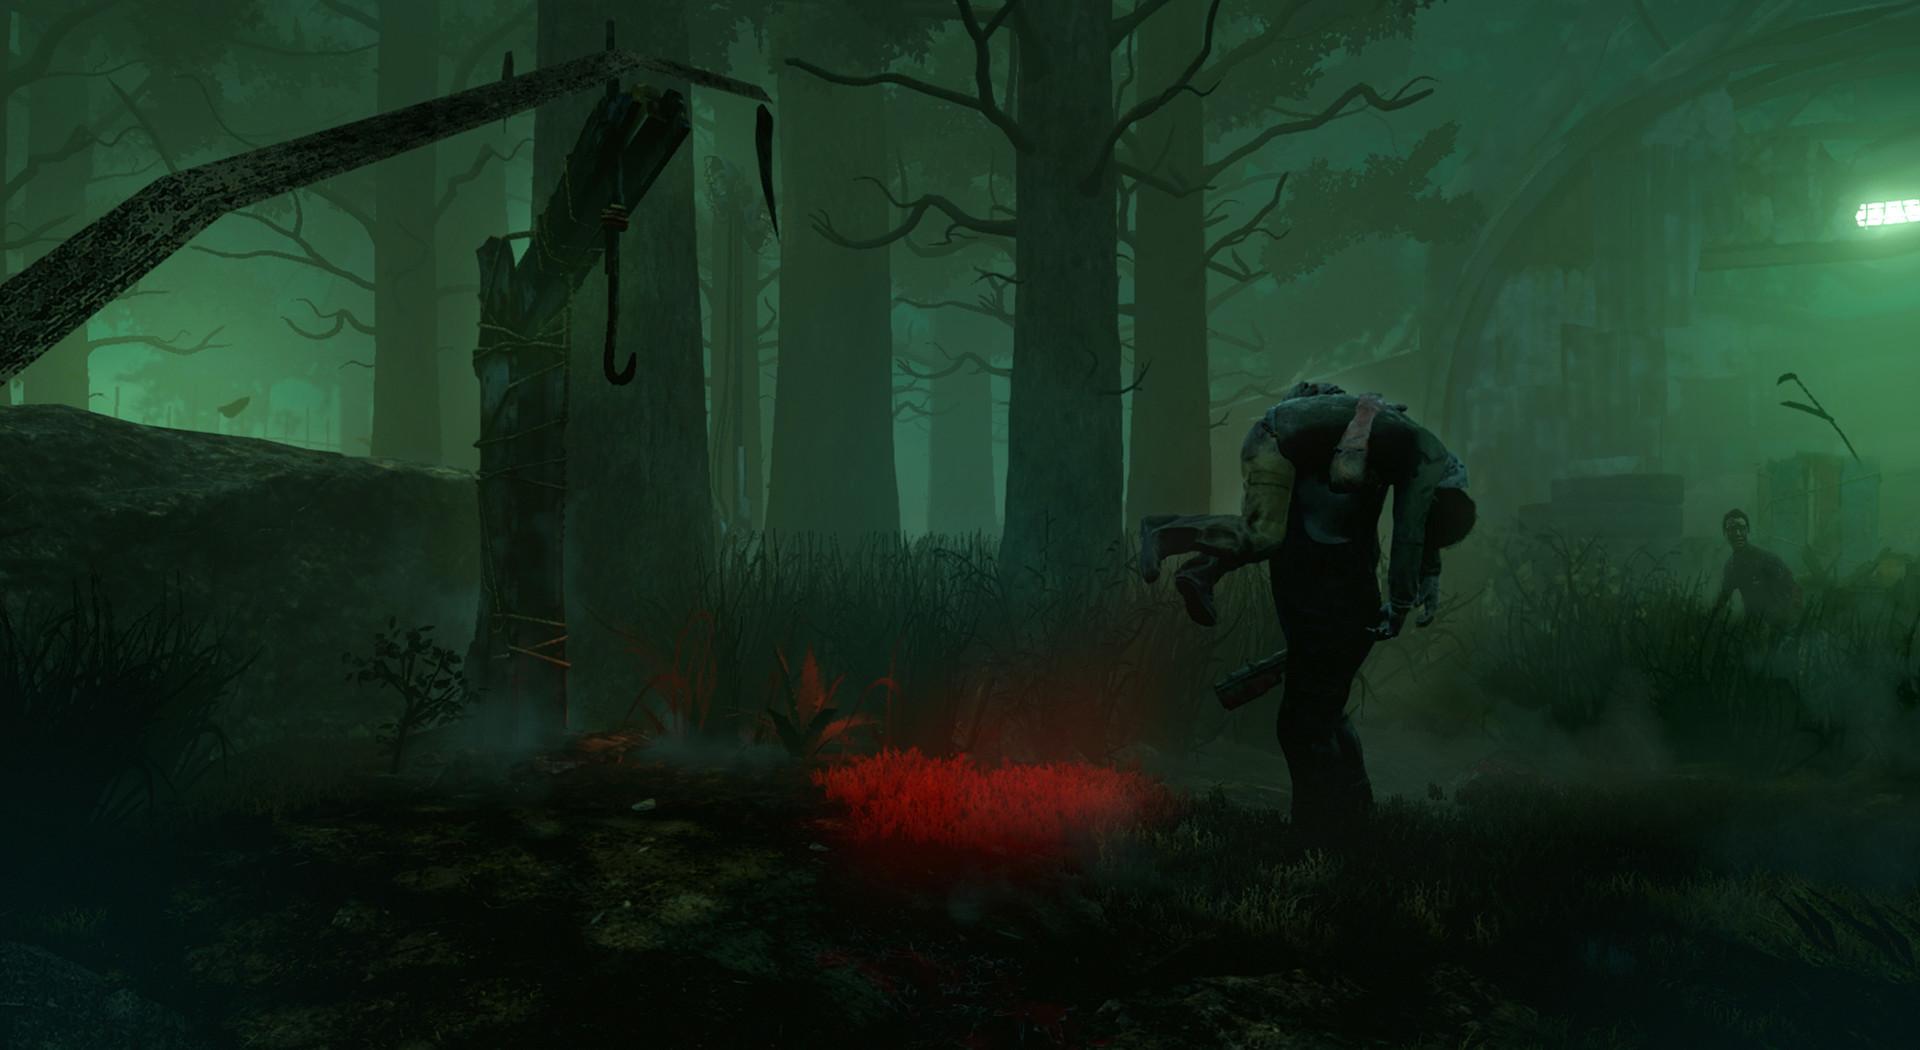 Dead by Daylight - Jagd Folter und Mord